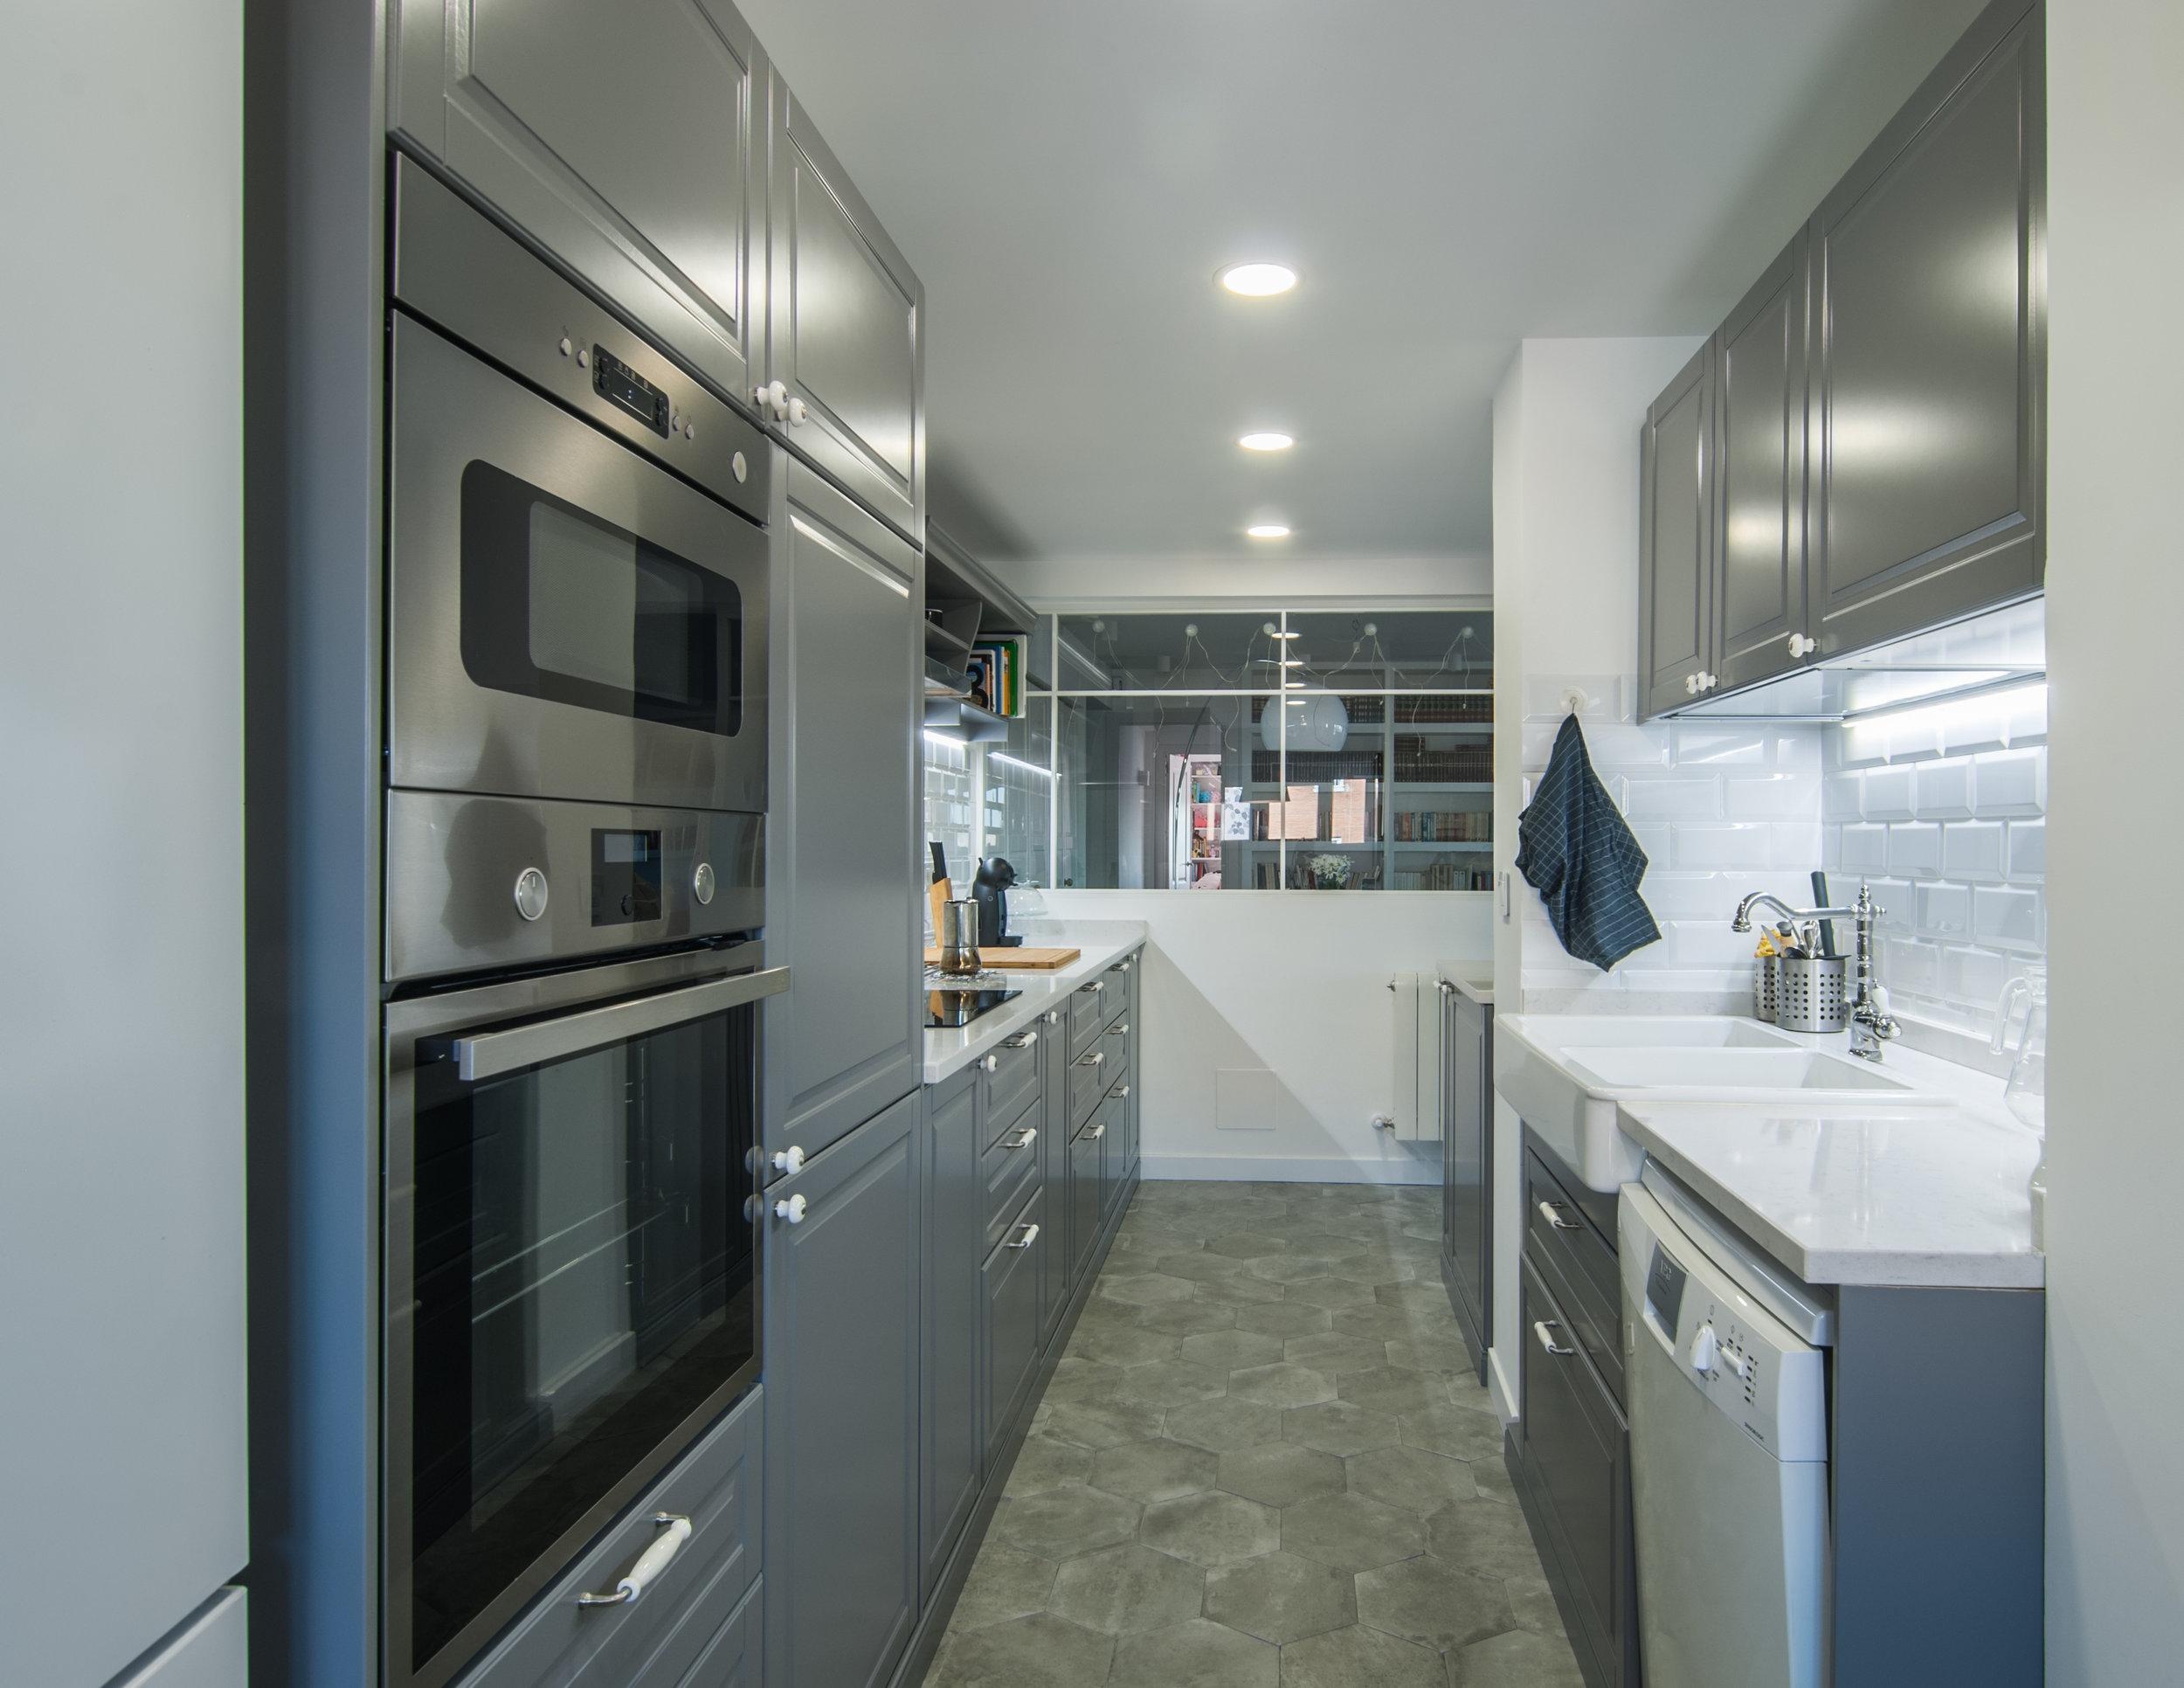 emmme studio slow design interiorismo integral cocina hogar Debora.jpg